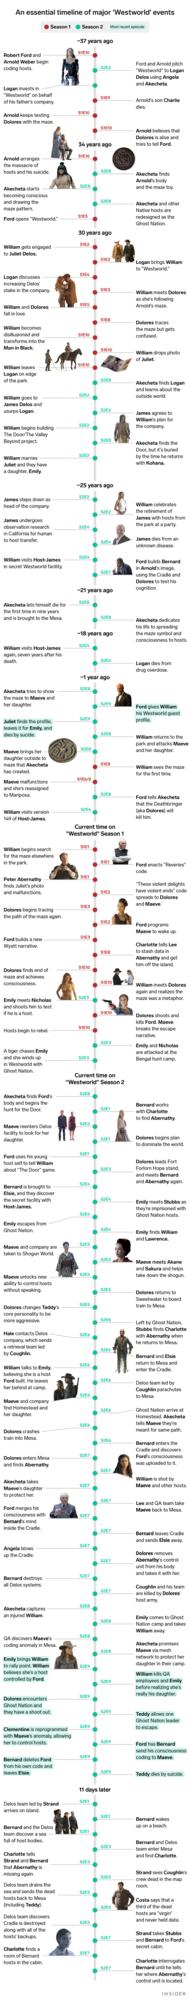 'Westworld' Timeline